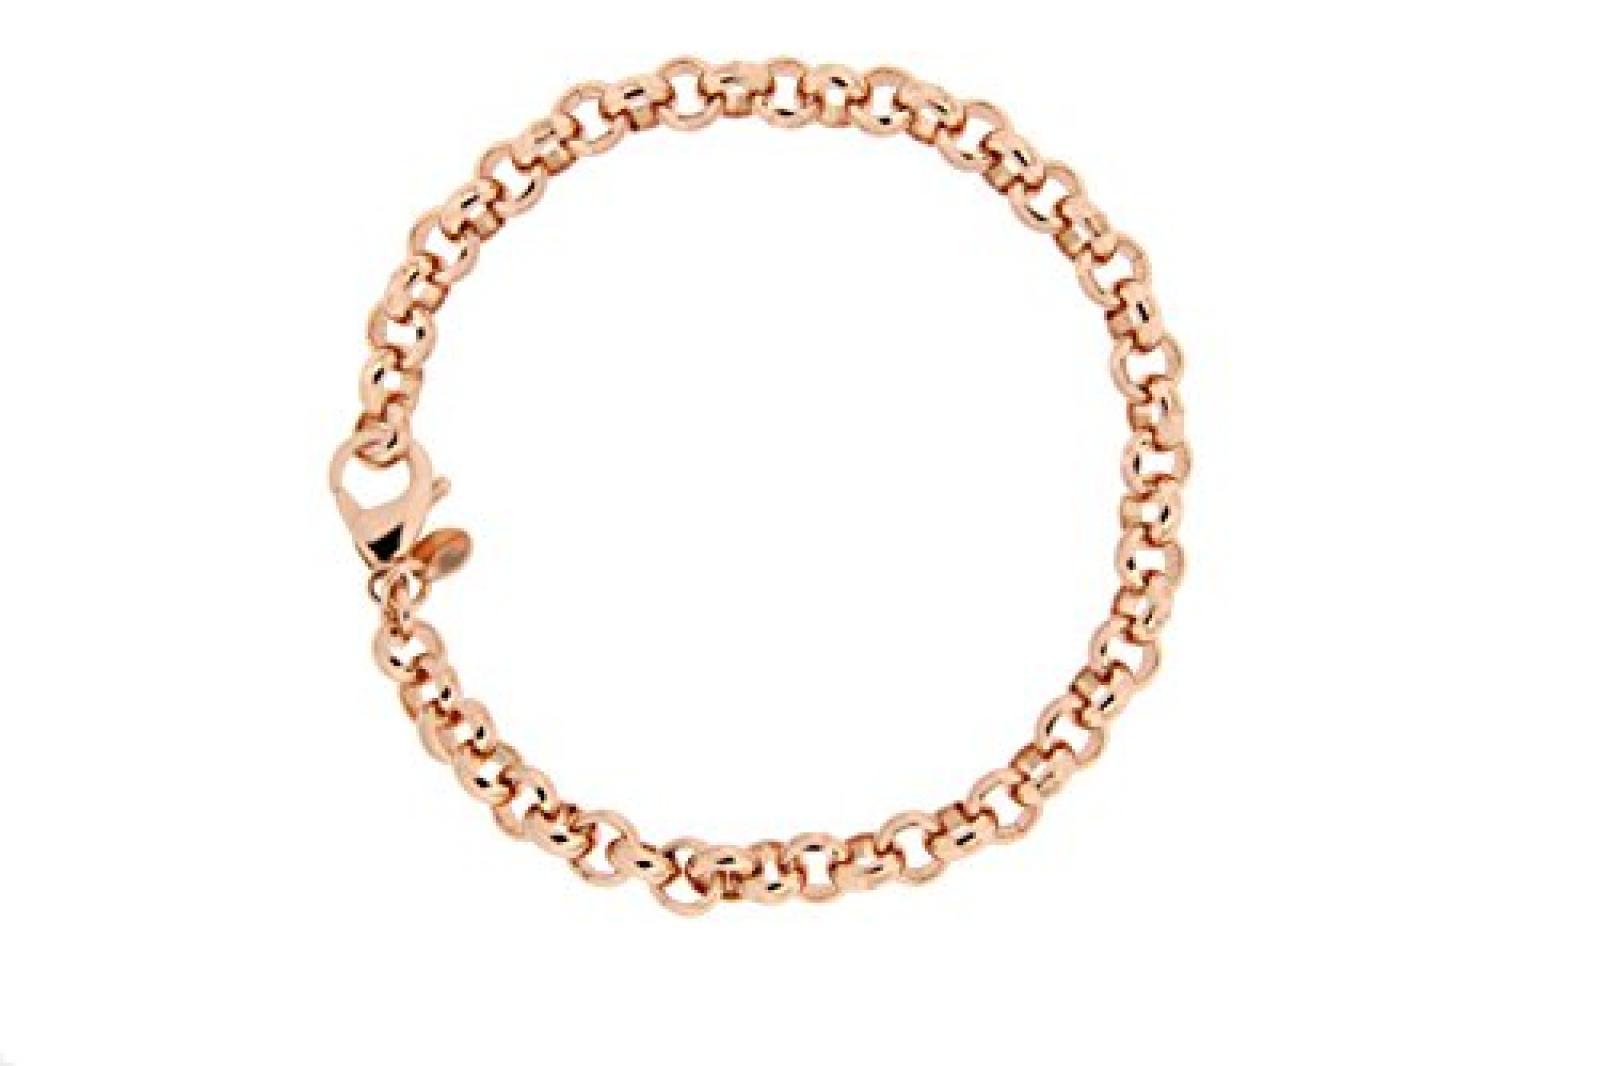 Kettenworld Damen Armband Bronze 21 cm 288522